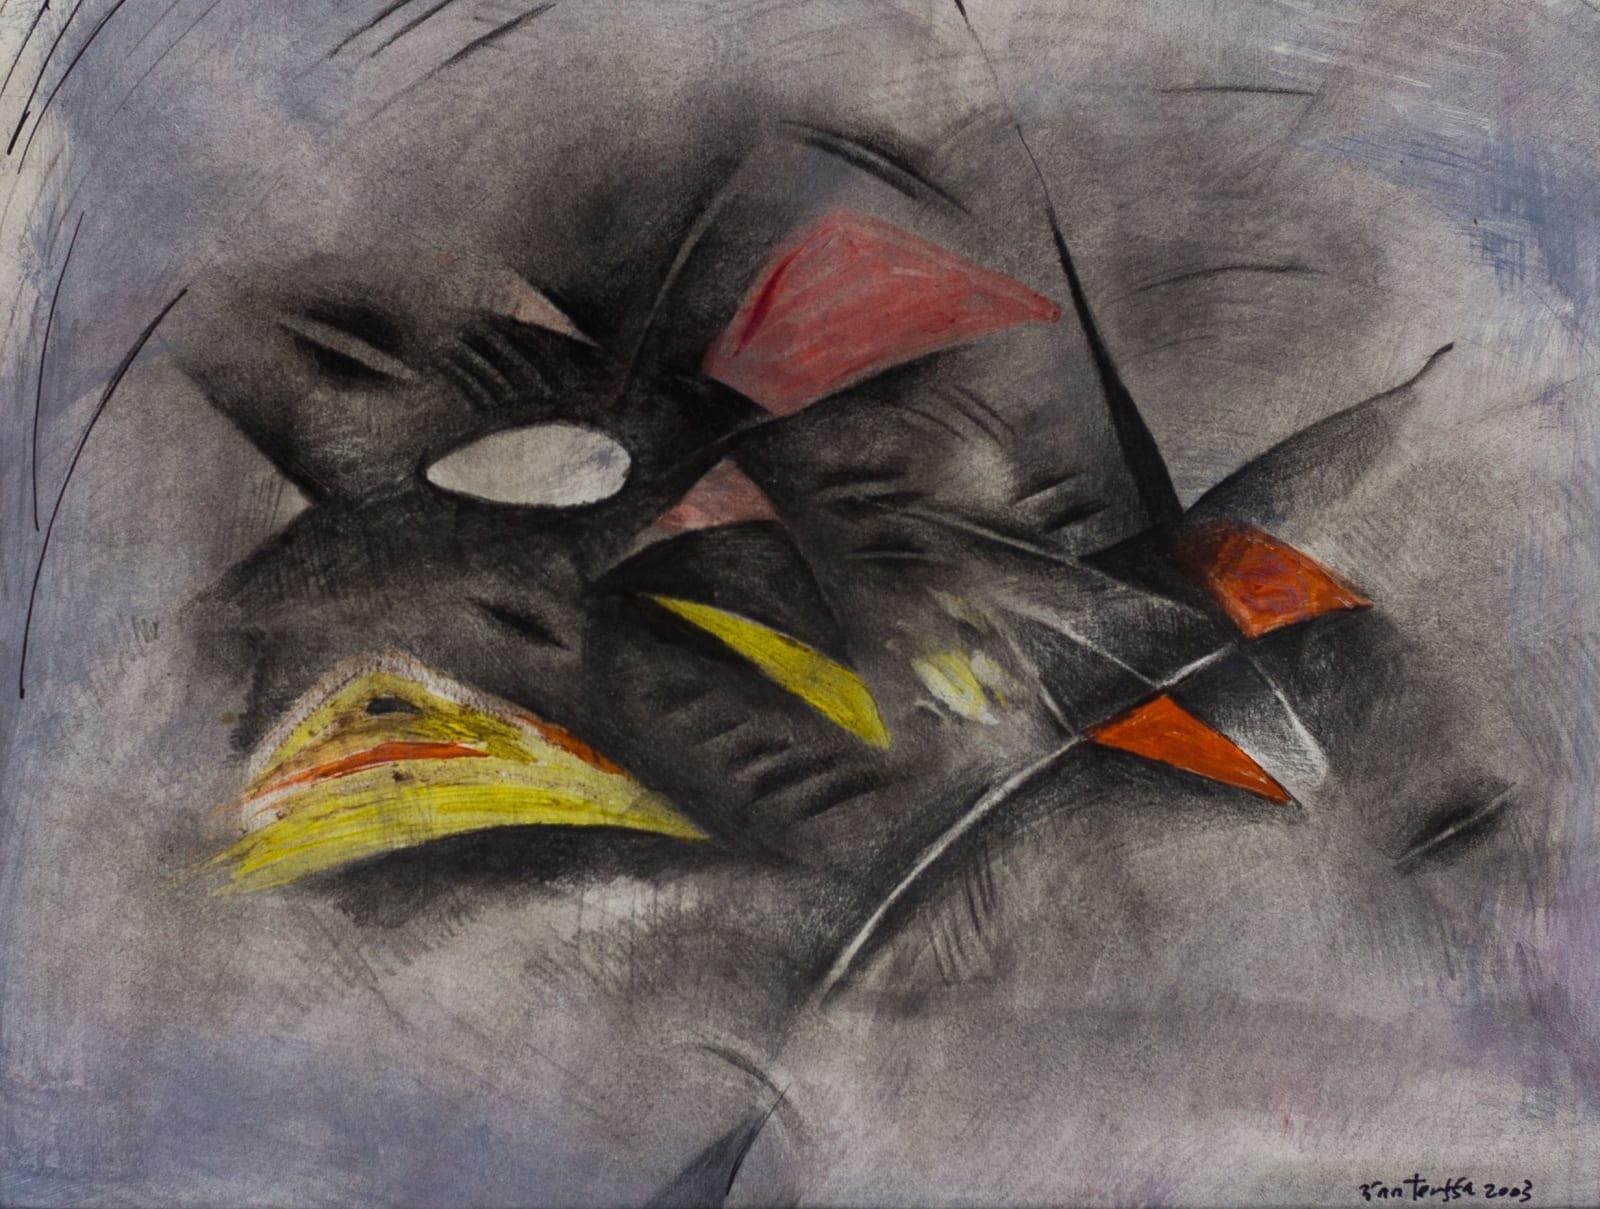 Tibebe Terffa , Untitled on Paper VIII, 2003